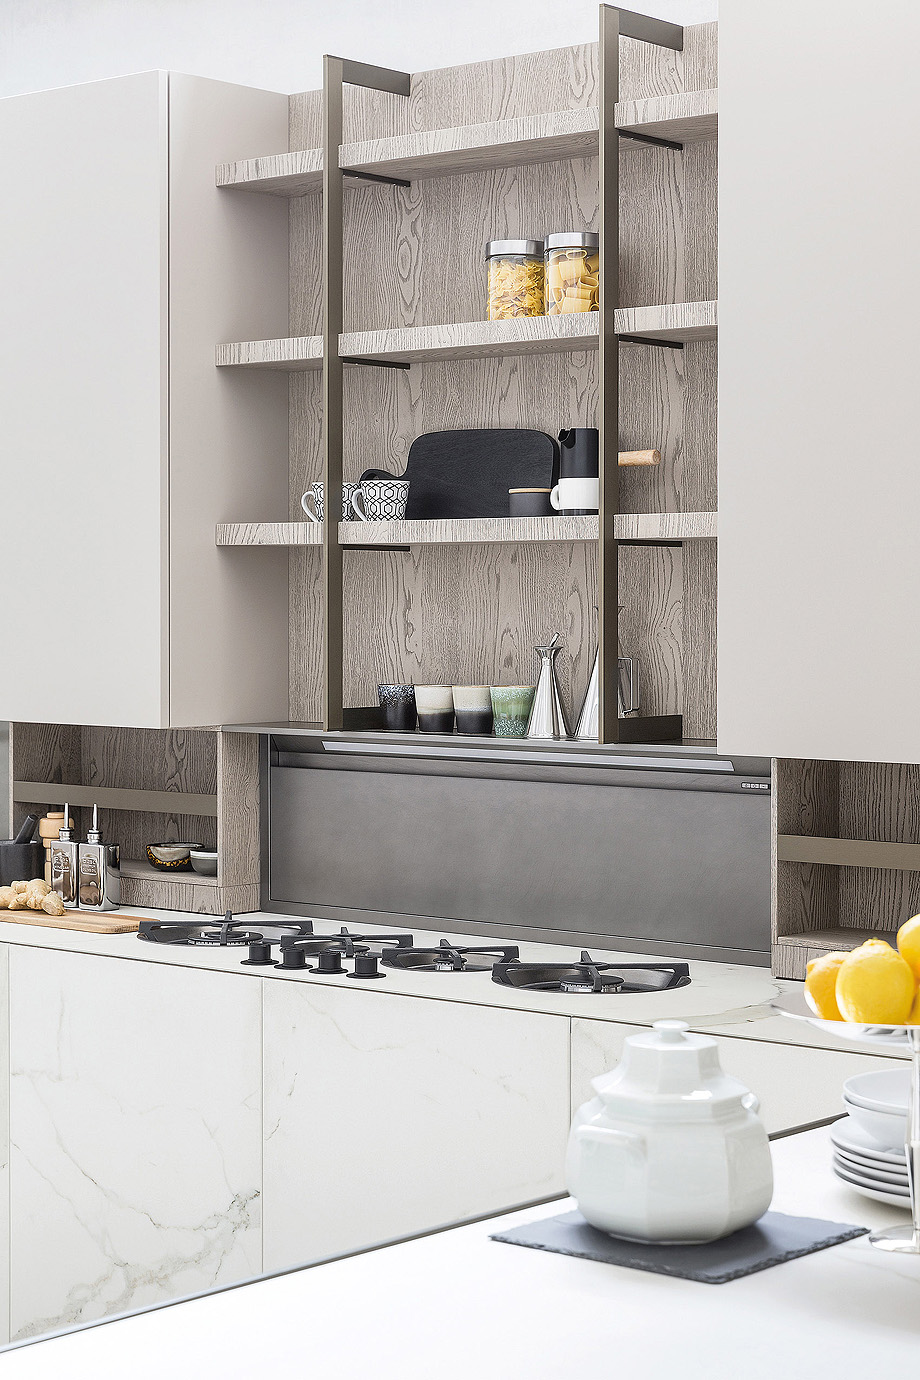 cocina segni de stefano cavazzana para zampieri (3)